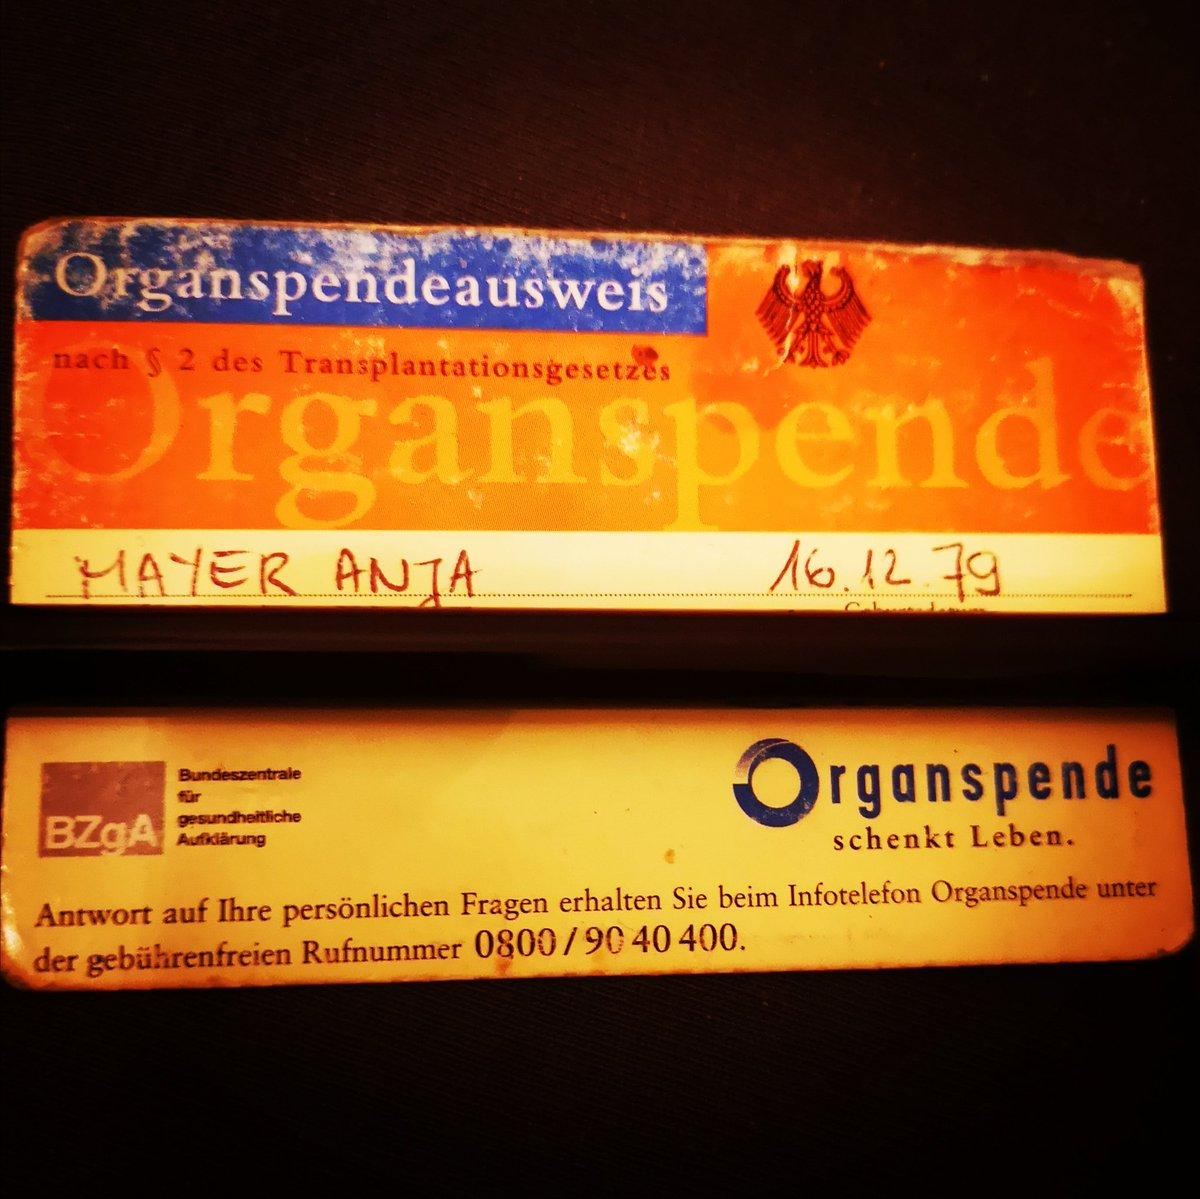 #Organspenden